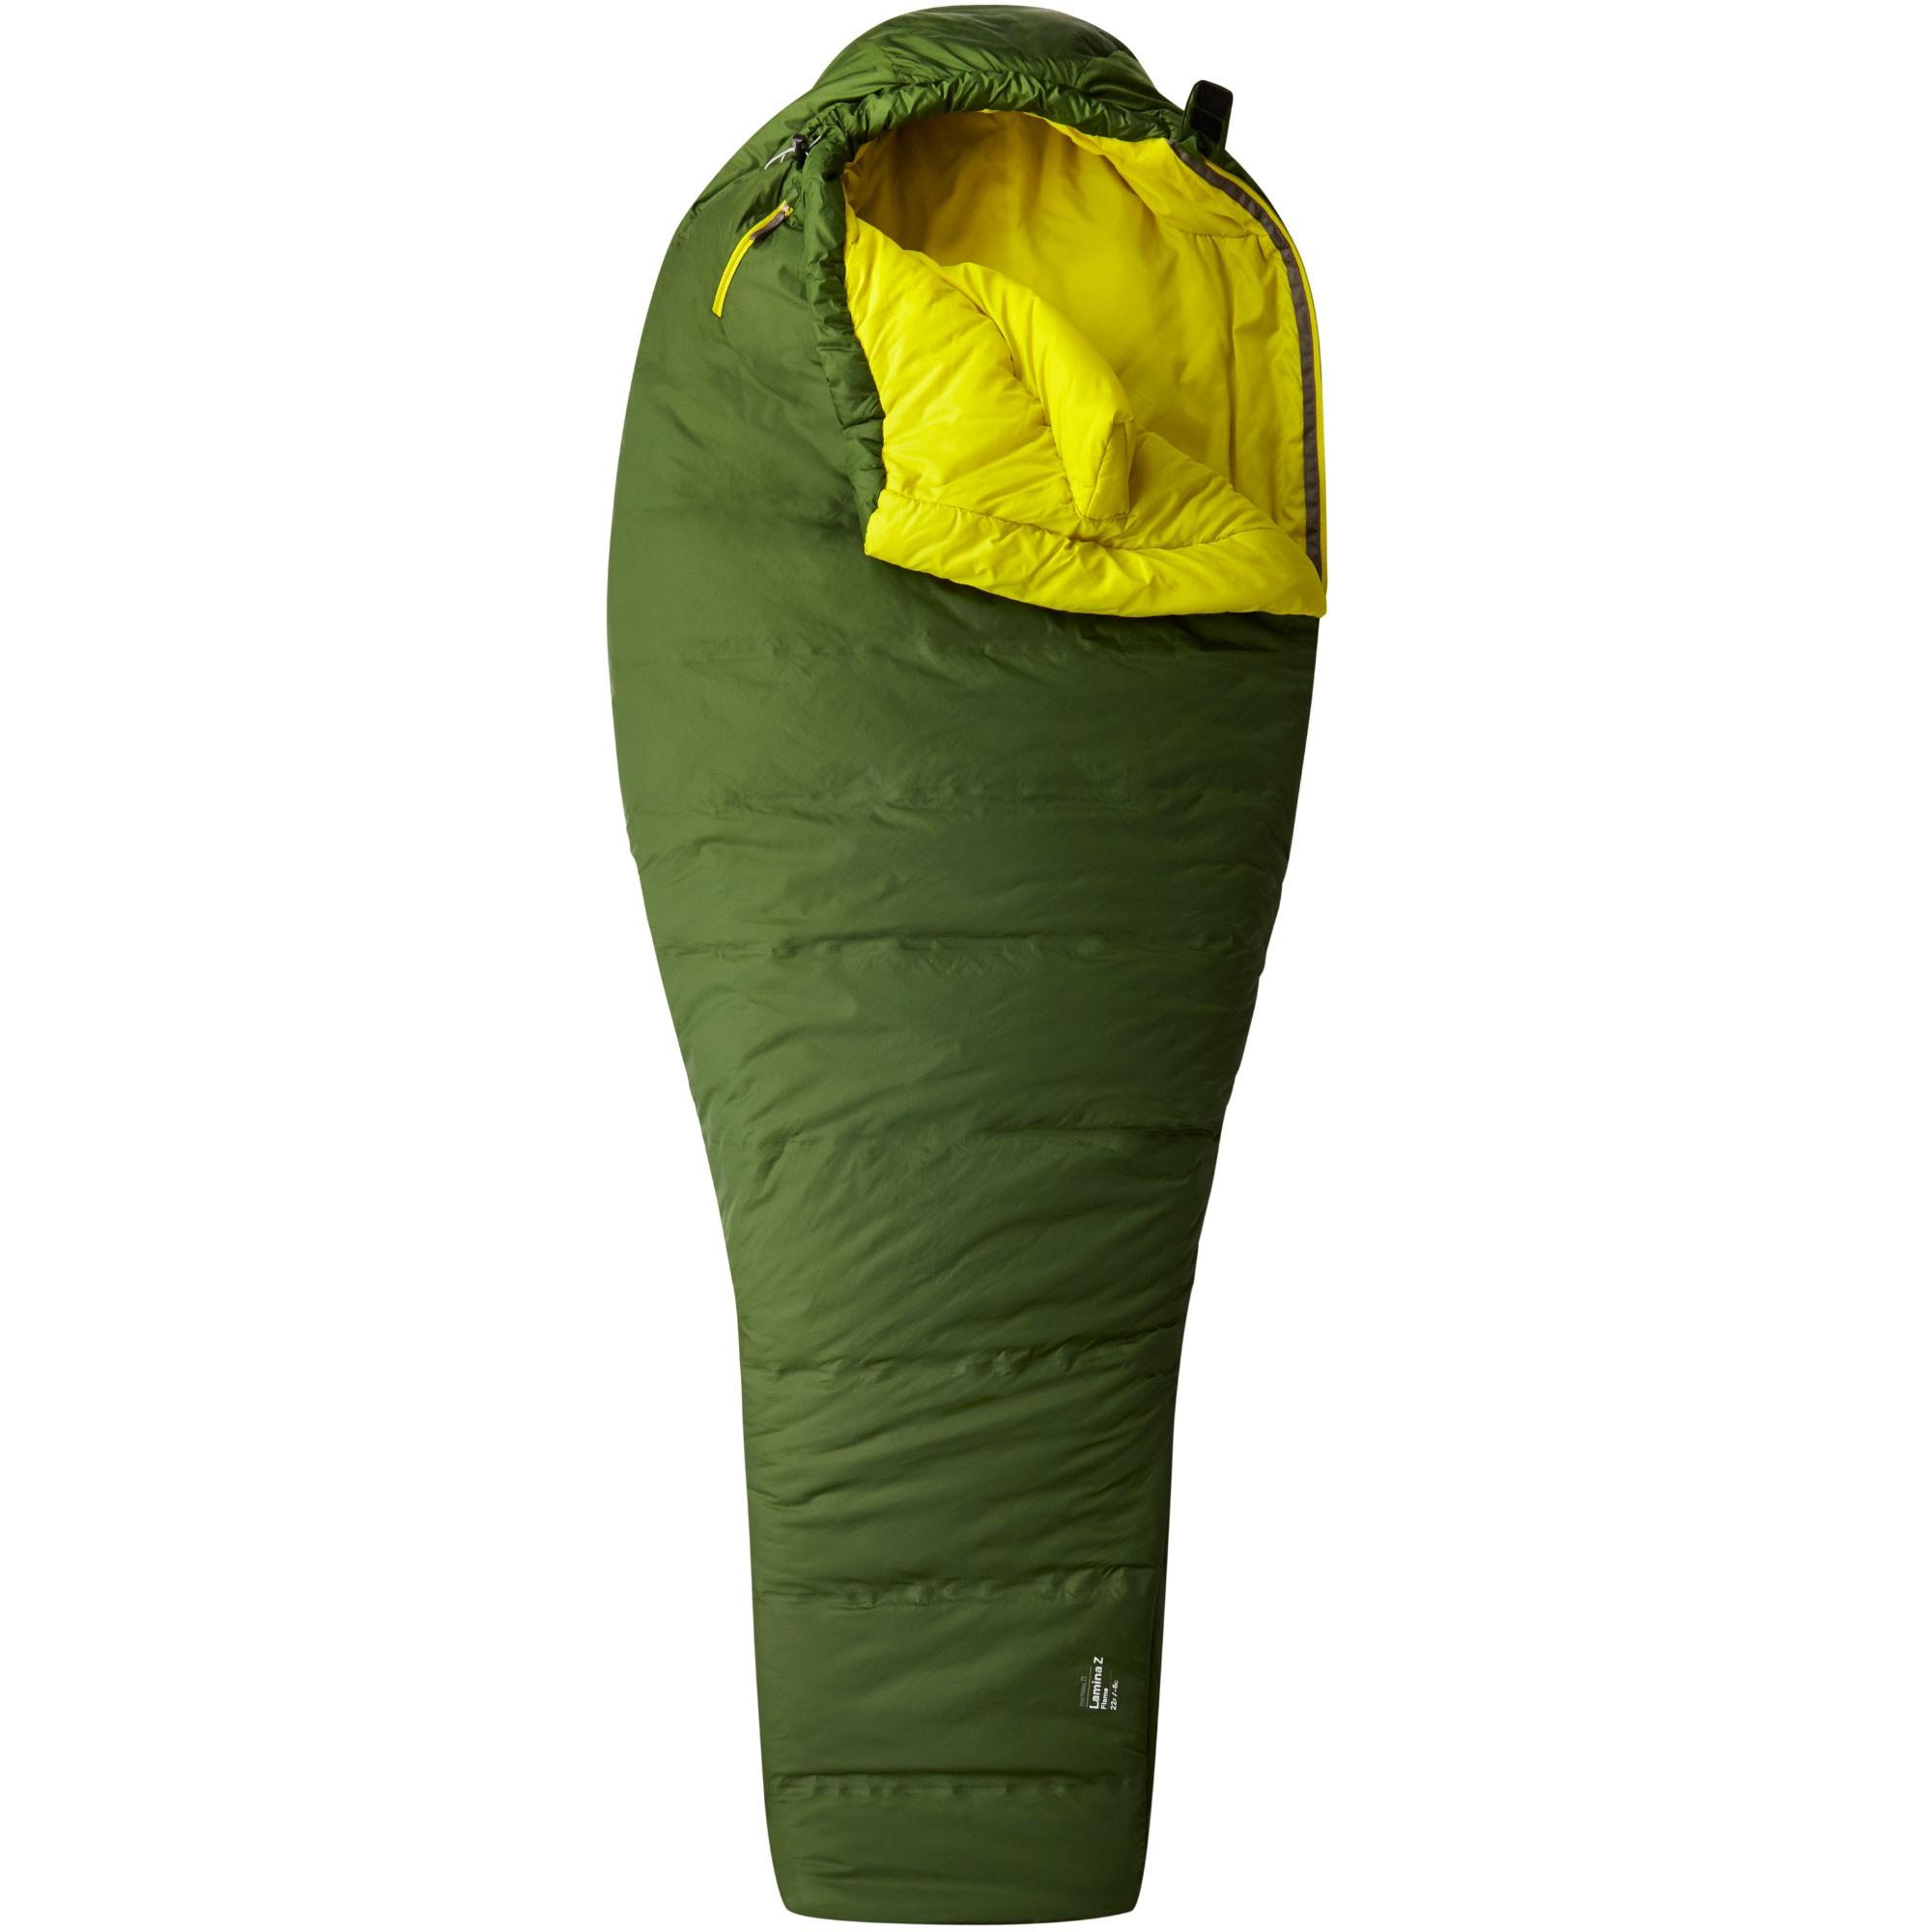 Mountain Hardwear Lamina Z Flame Men's Synthetic Insulated Sleeping Bag - Woodland